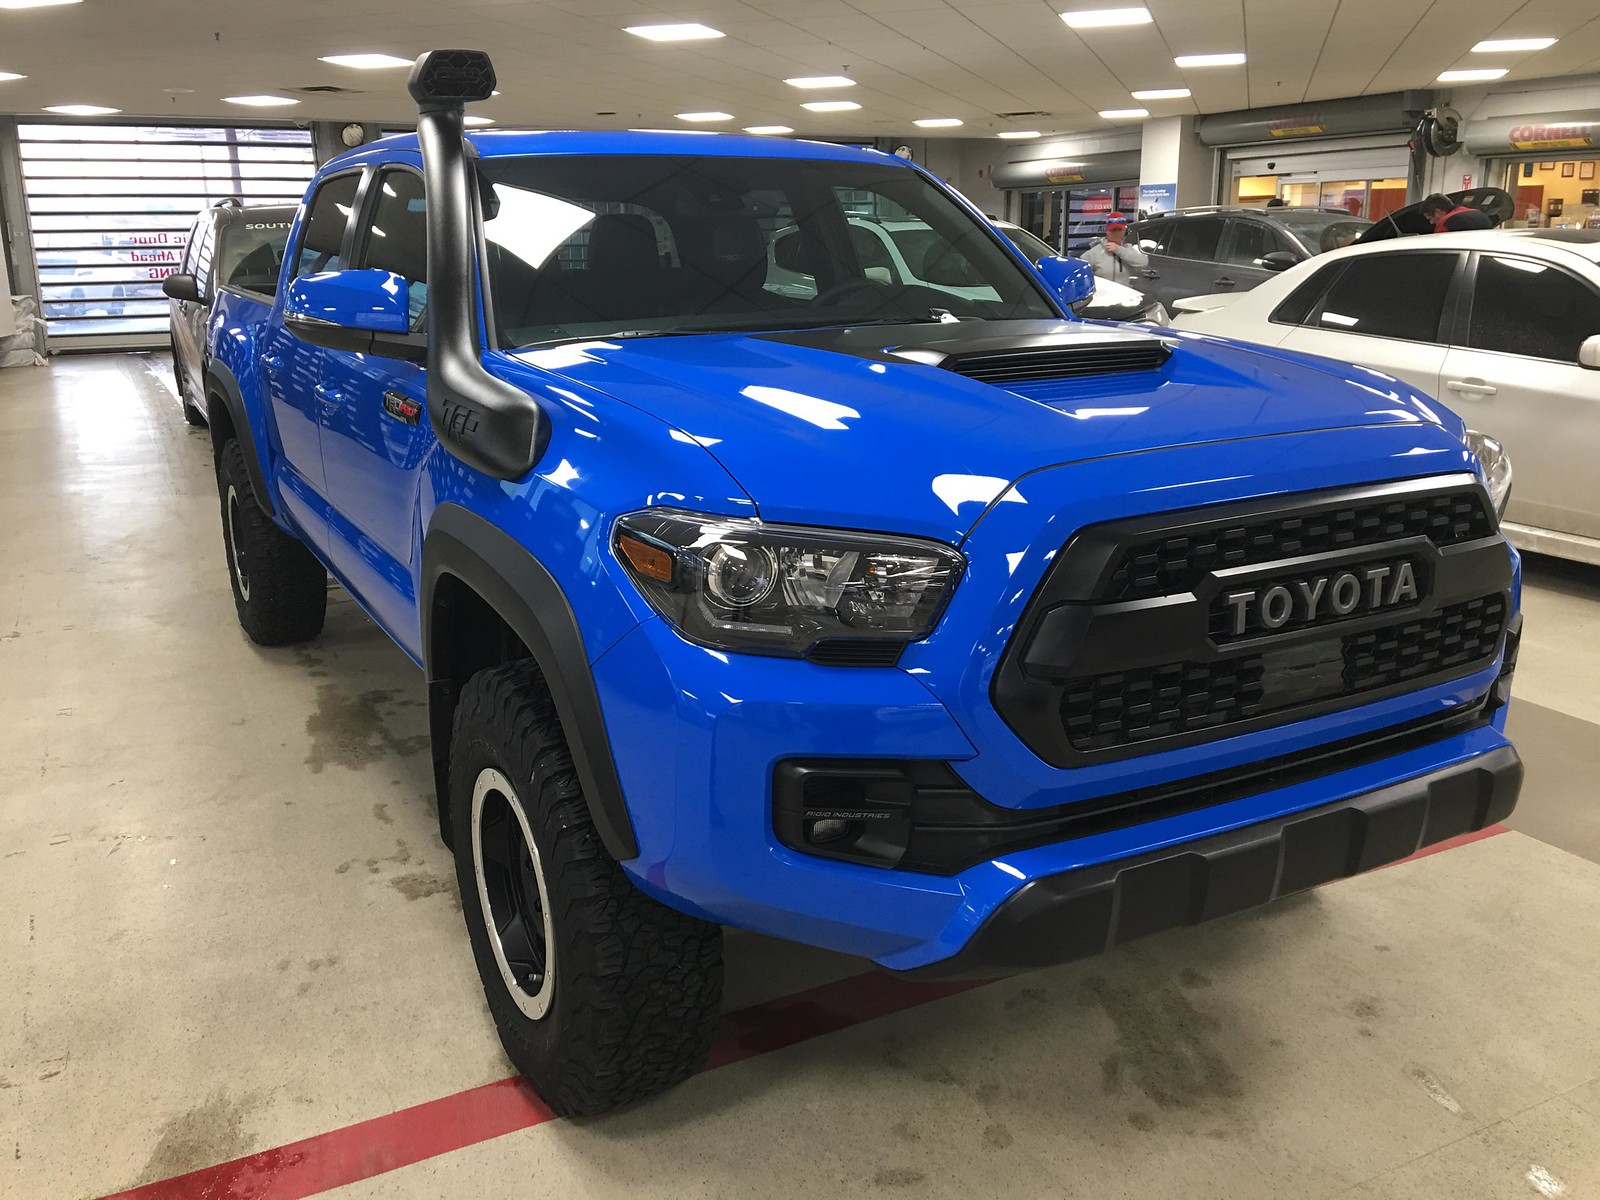 2019 Pro Build Voodoo Blue Tacoma World